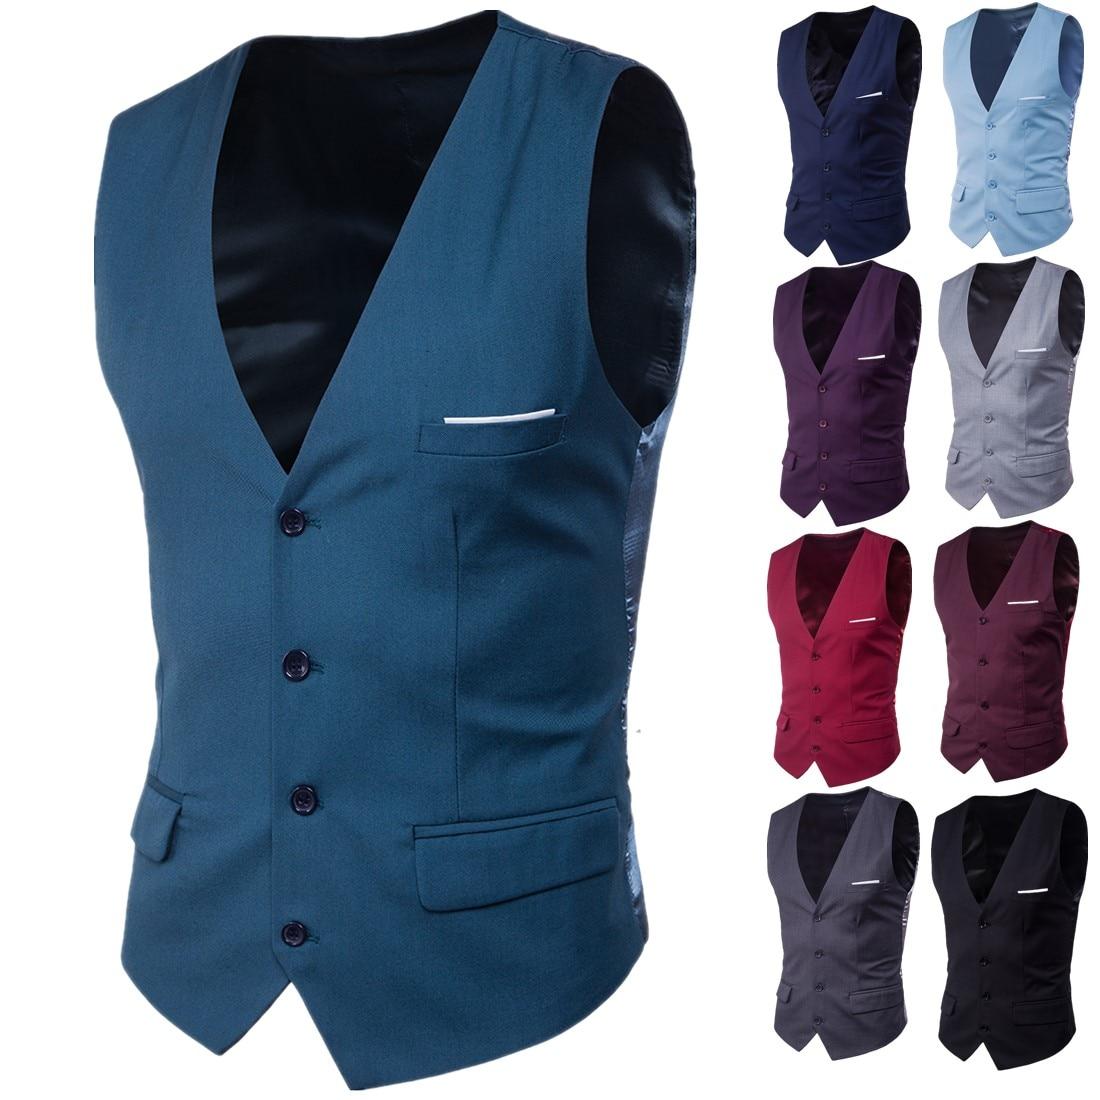 2019 New Arrival Dress Vests For Men Slim Fit Mens Suit Vest Male Waistcoat Homme Smart Casual Sleeveless Formal Business Jacket